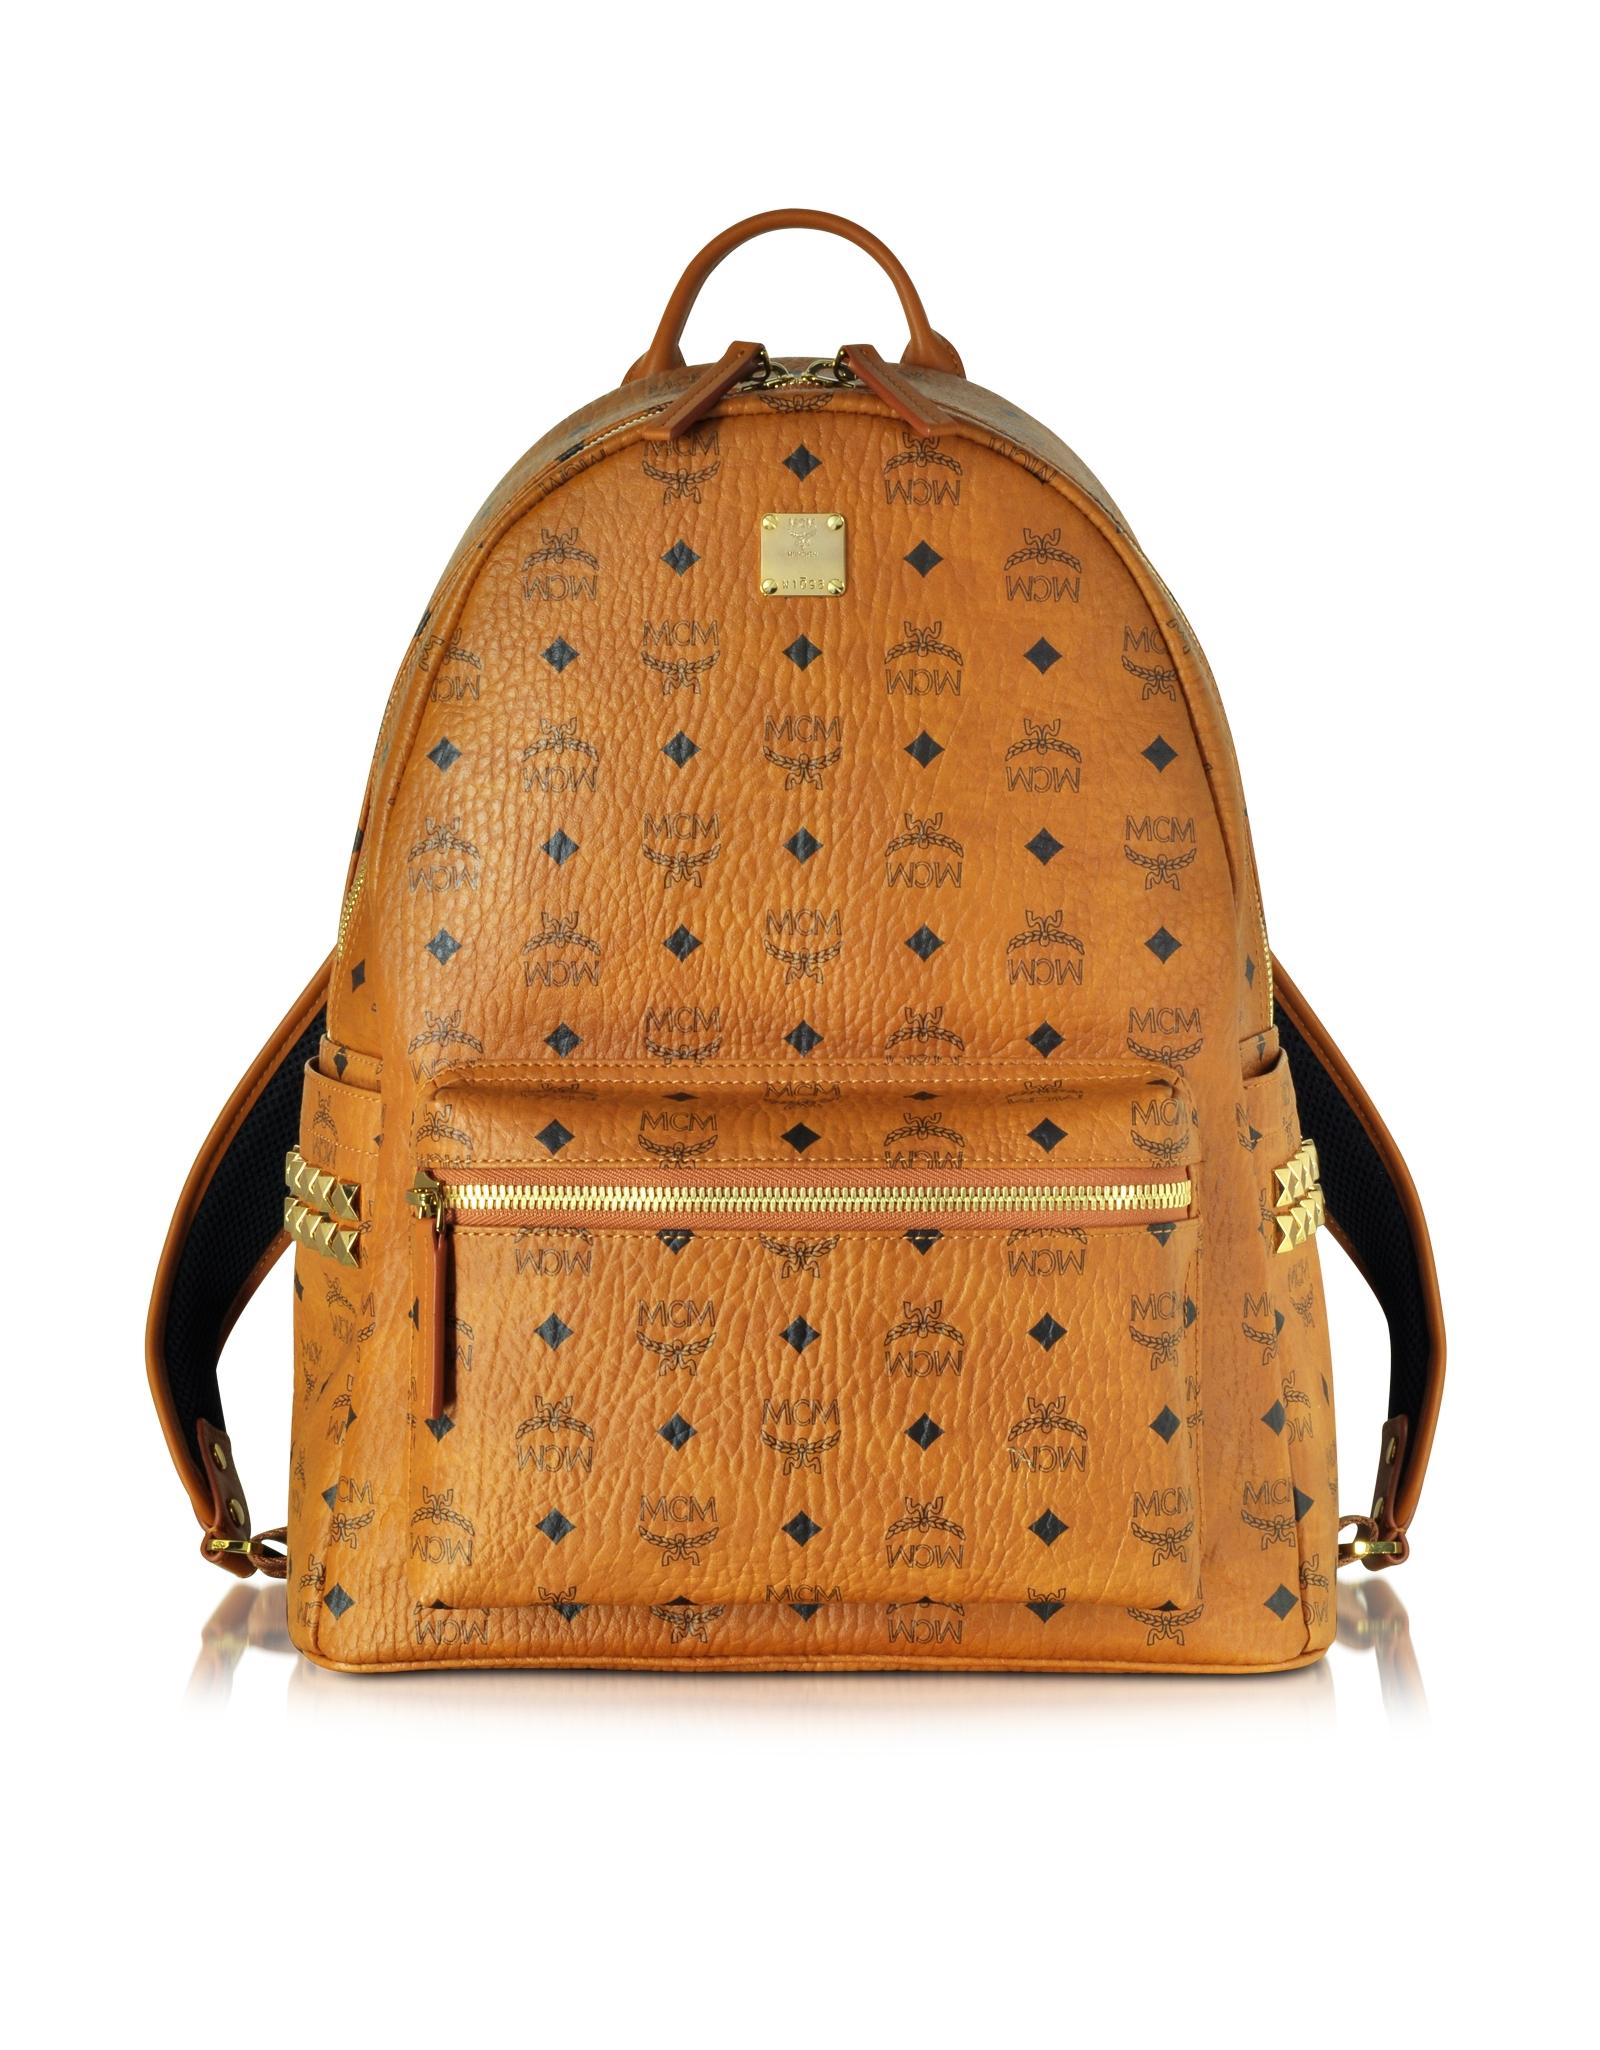 Mcm Medium Stark Cognac Backpack in Khaki (cognac)